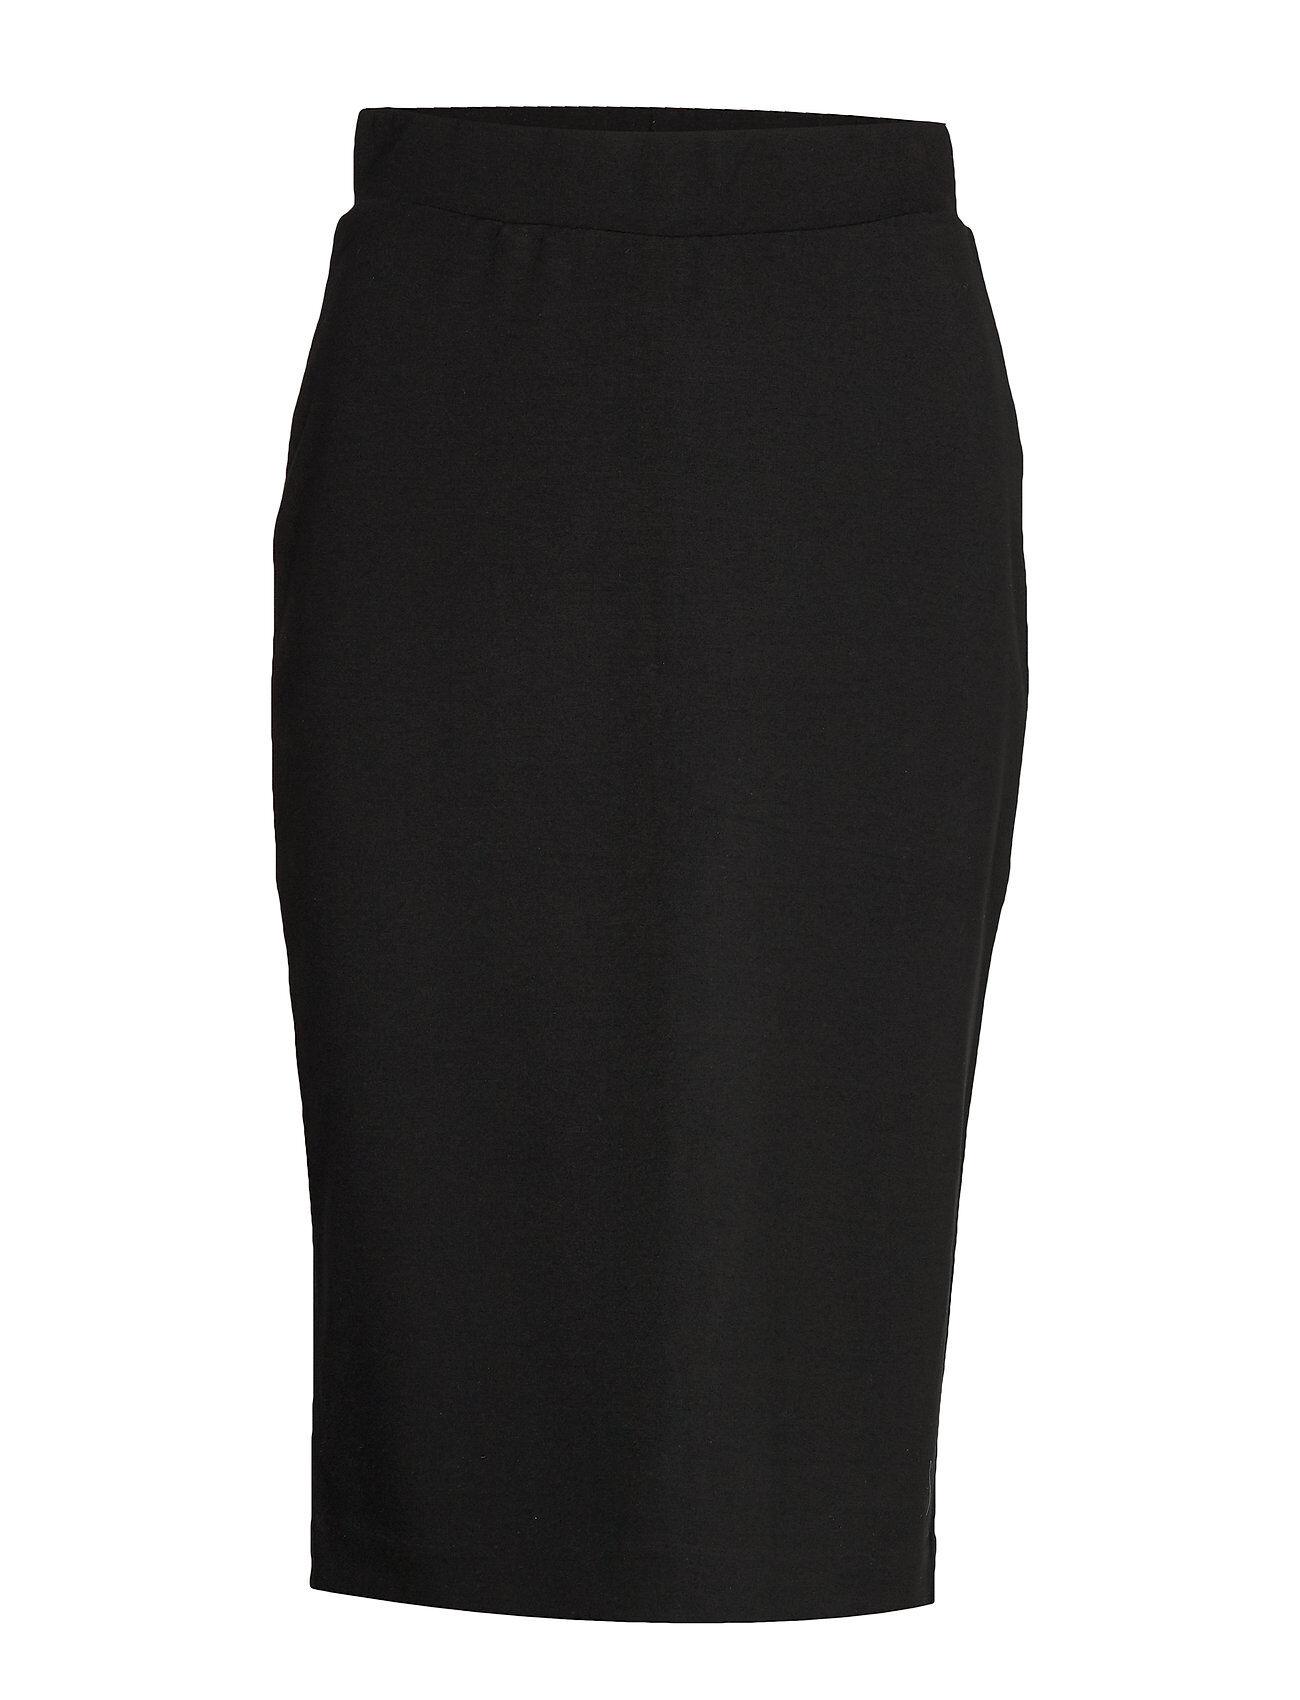 Selected Femme Slfshelly Mw Pencil Skirt B Noos Polvipituinen Hame Musta Selected Femme